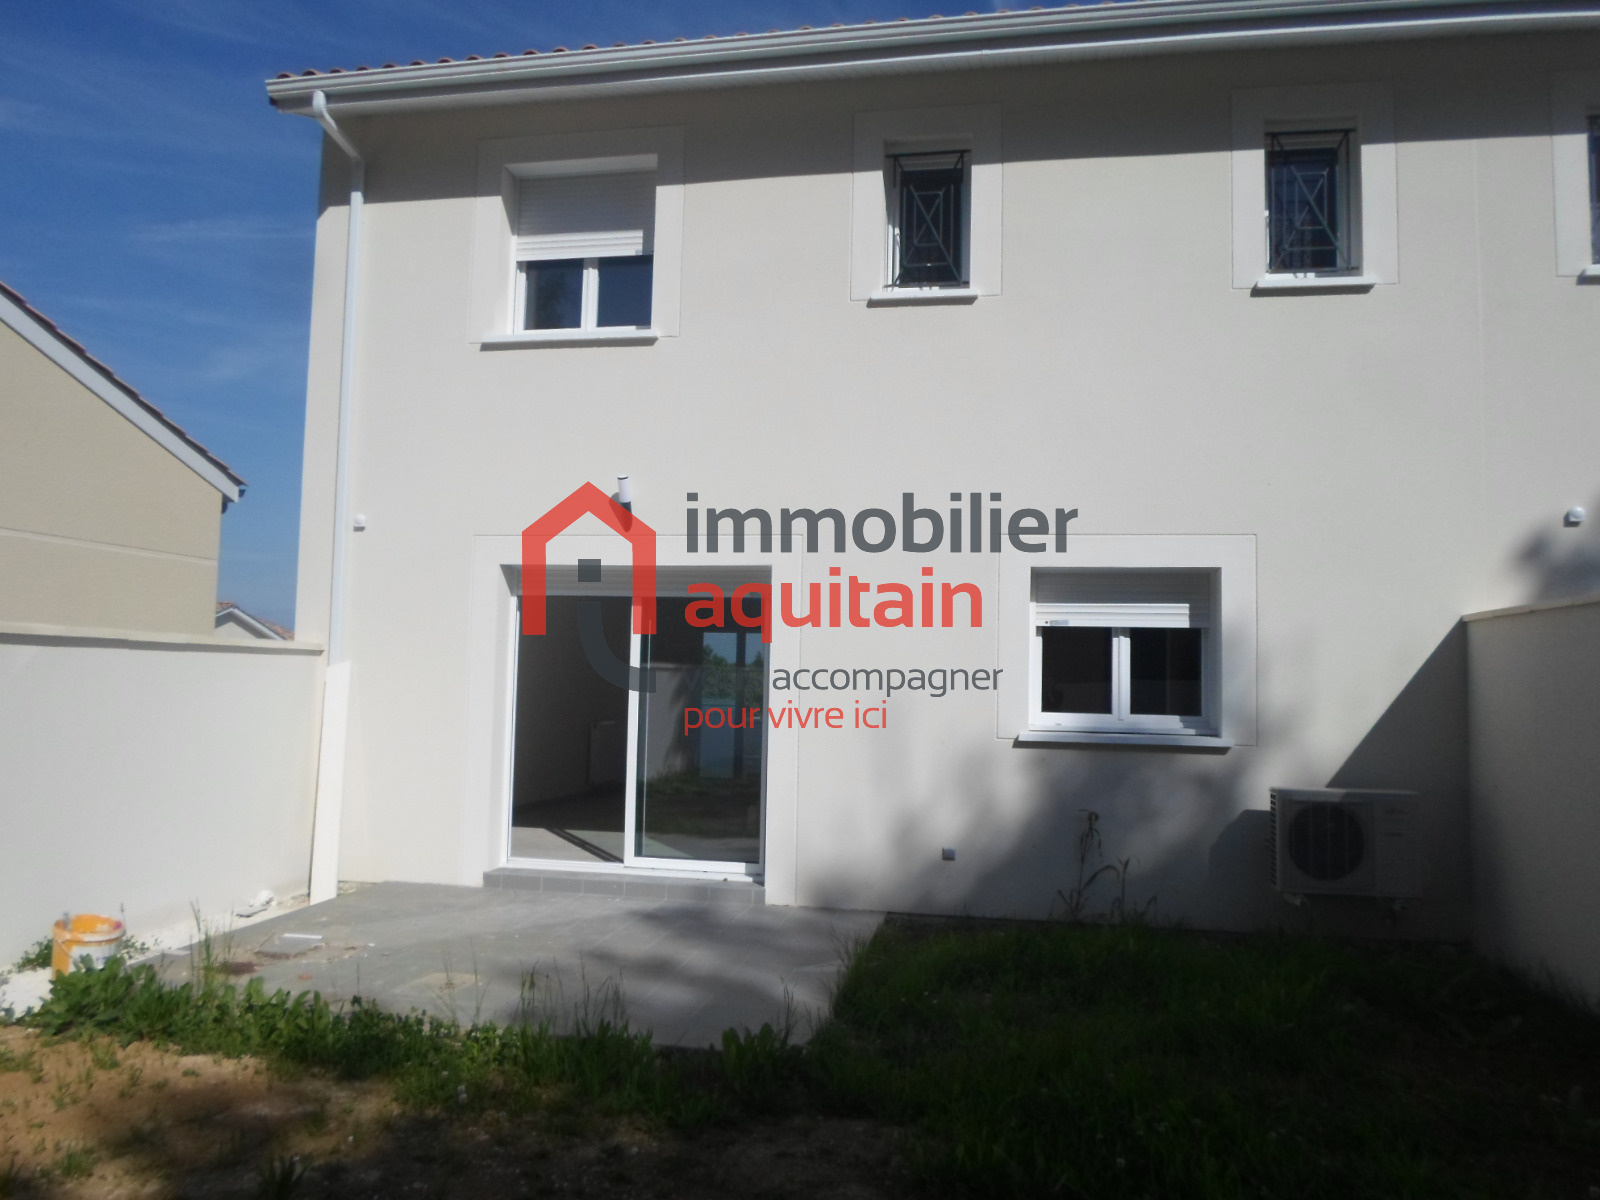 Immobilier aquitain l 39 immobilier libourne arveyres for Appartement libourne